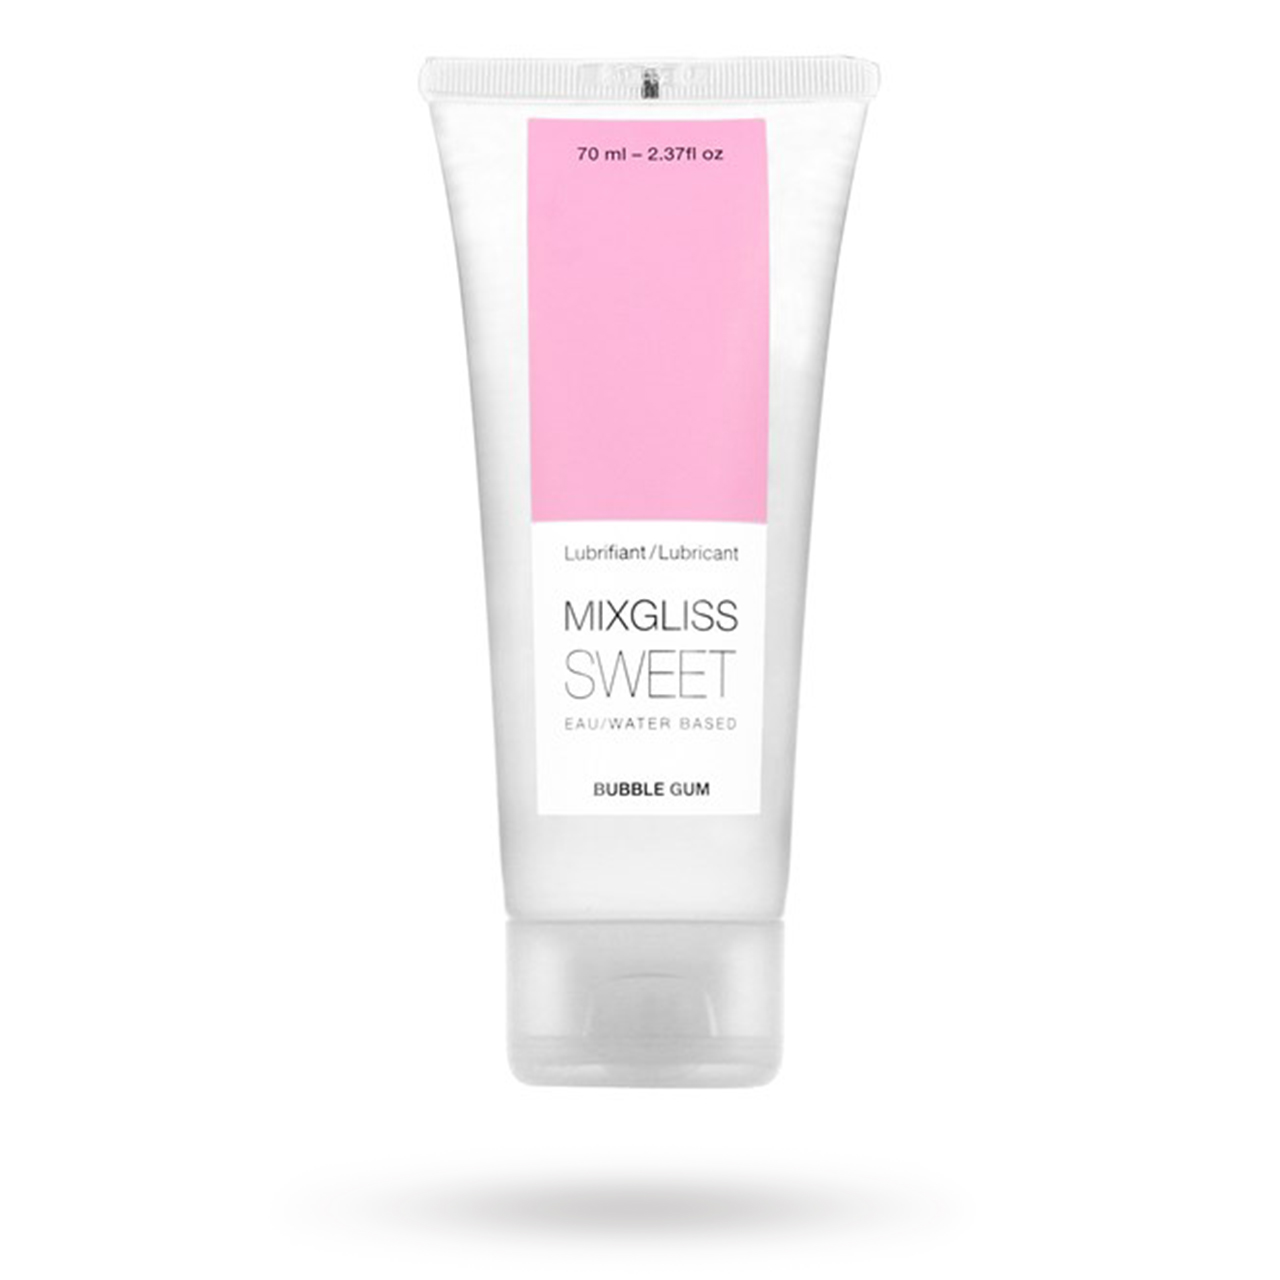 Waterbased Sweet Bubble Gum   GLIDMEDEL ETC., GLIDMEDEL, Vattenbaserade glidmedel   Intimast.se - Sexleksaker